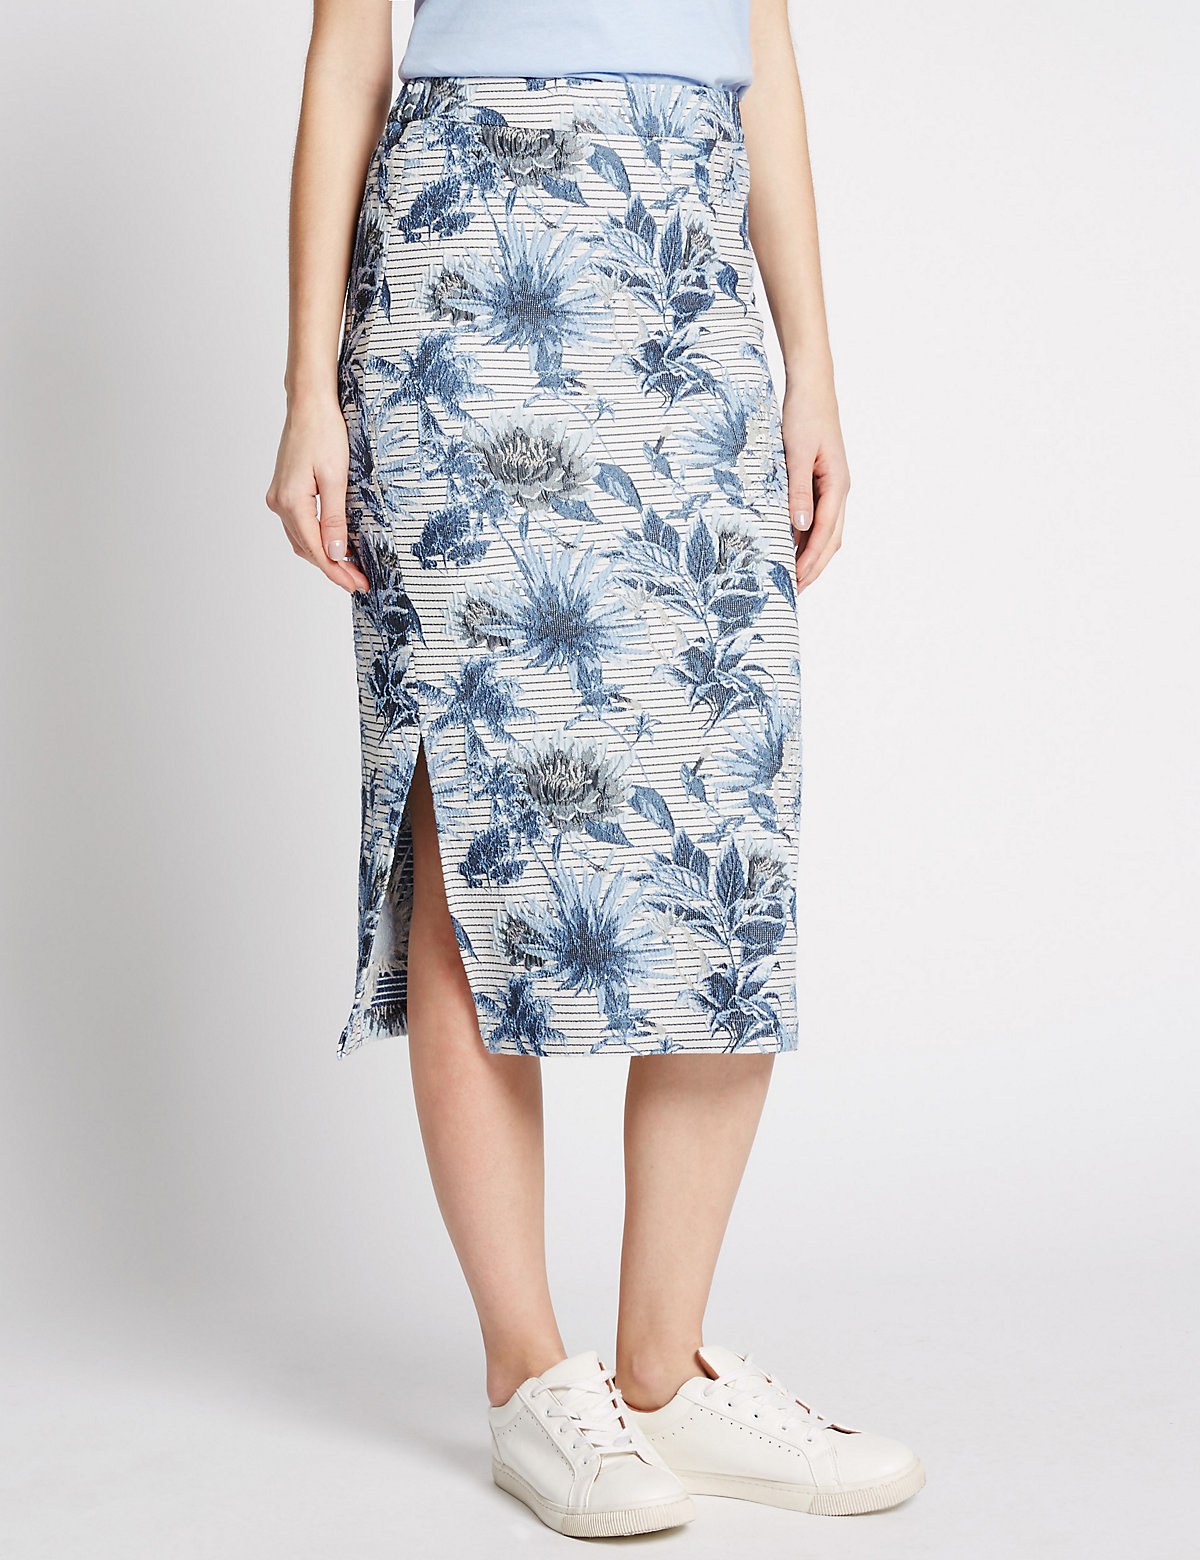 Limited Edition Jacquard Print Pencil Skirt